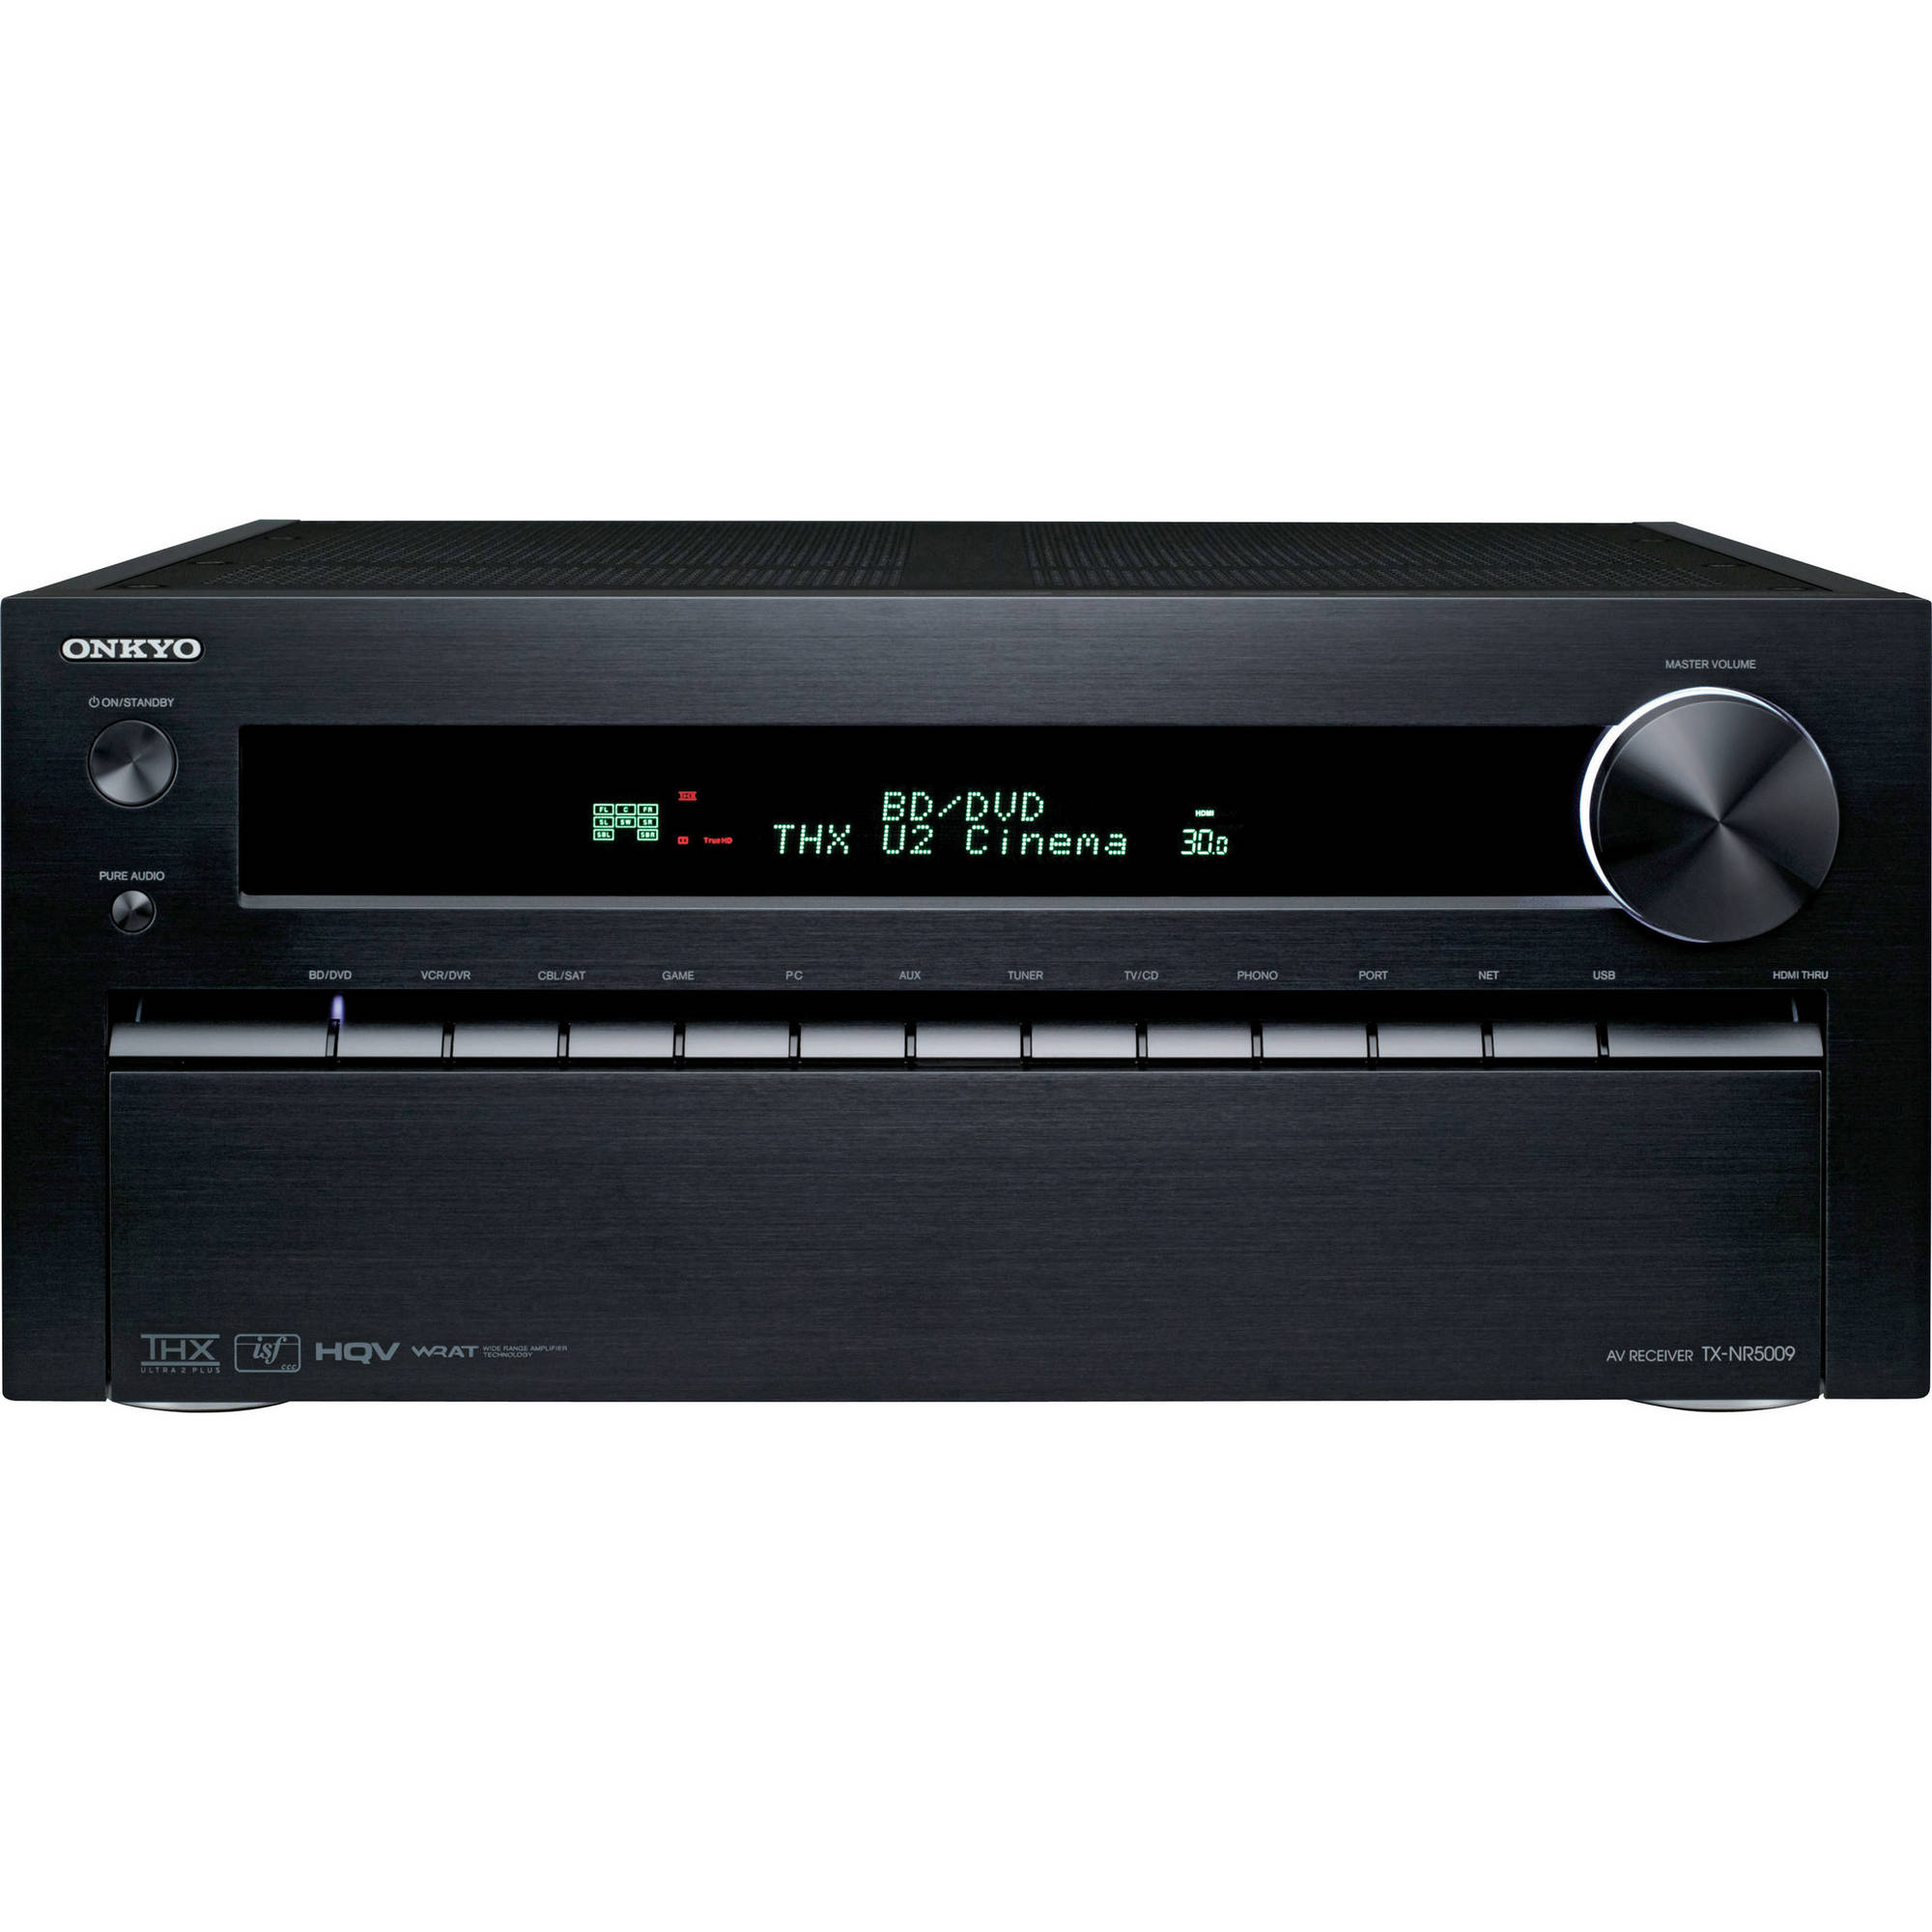 Onkyo TX-NR5009 9 2-Channel A/V Receiver